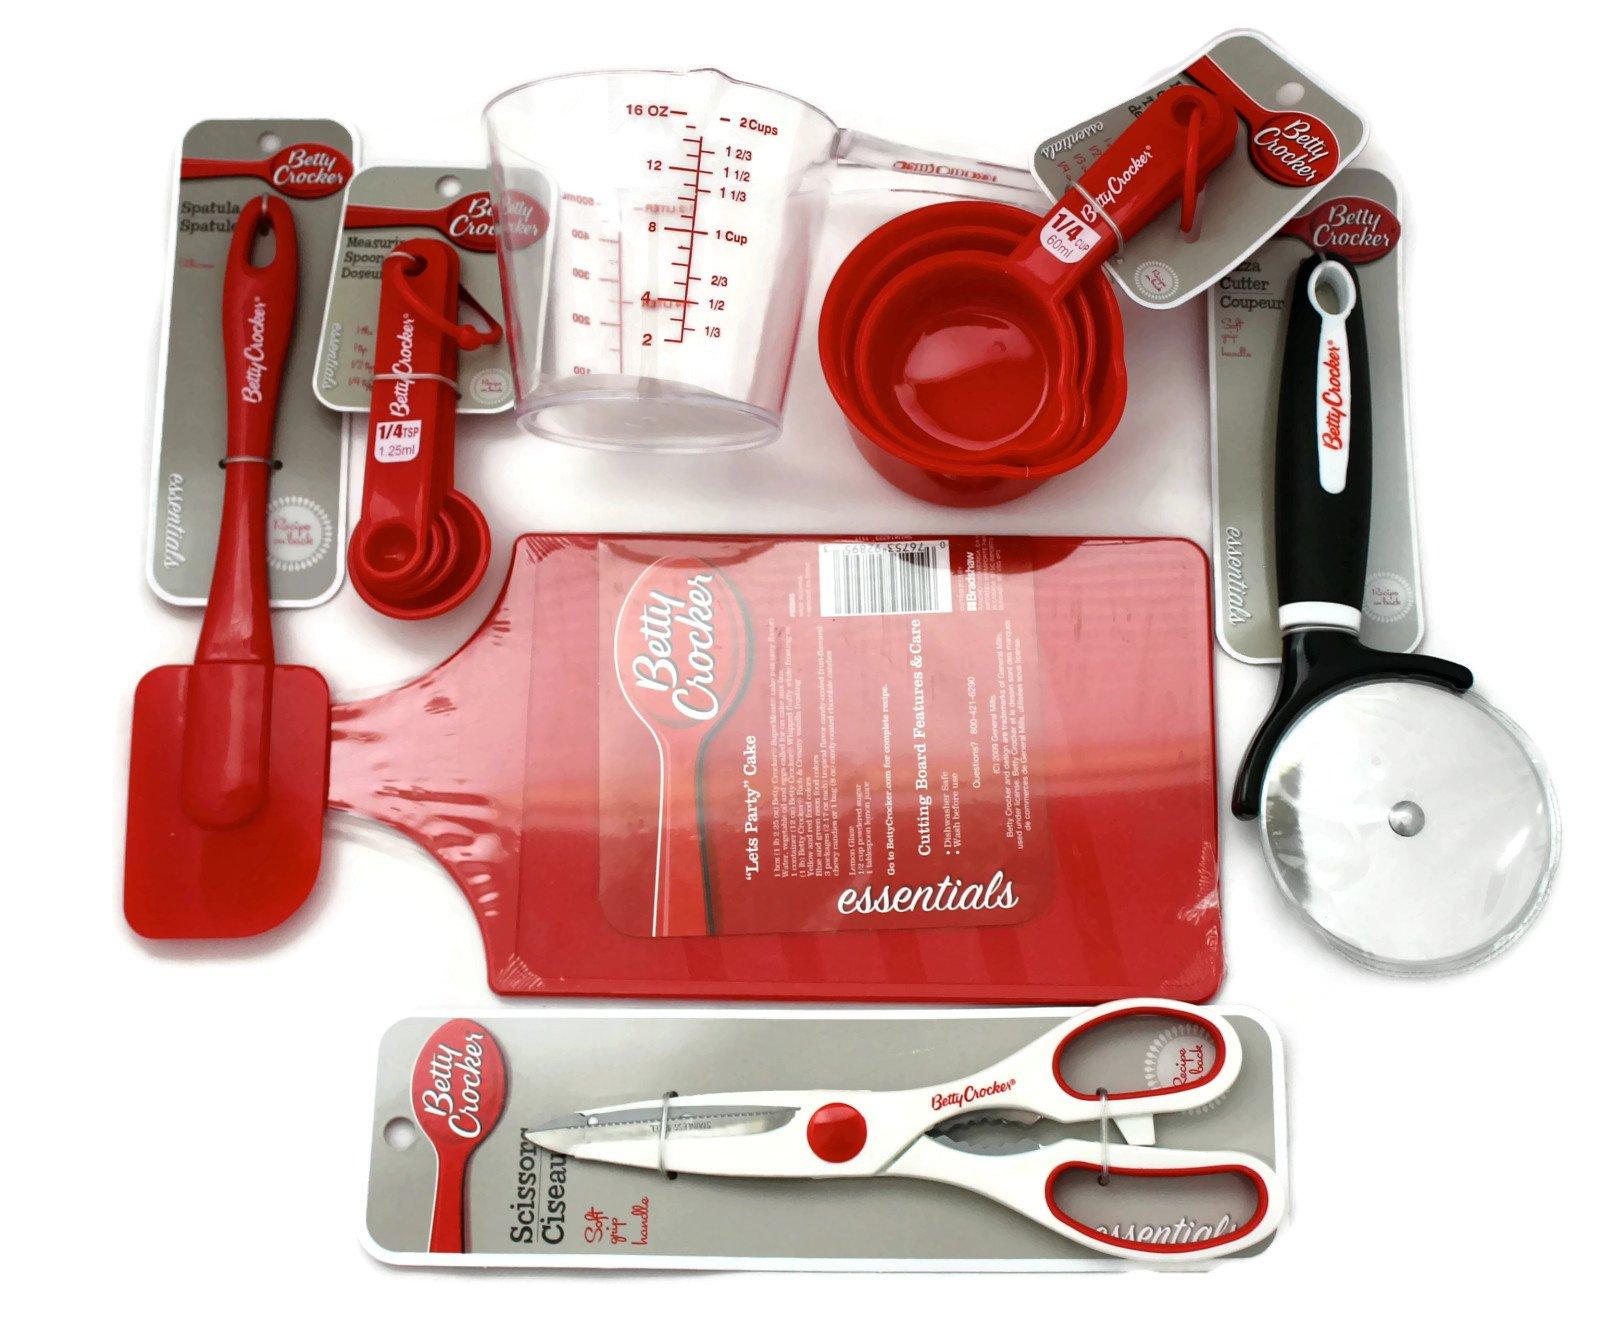 Bundle of 7 Betty Crocker Essential ''Starter'' Kitchen Gadgets- Includes Measuring Cups, Measuring Spoons, Spatula, Cutting Board, Pizza Cutter, Scissors, 2 Cup Measuring Cup Plus SIX FANTASTIC Betty Crocker Recipes!!